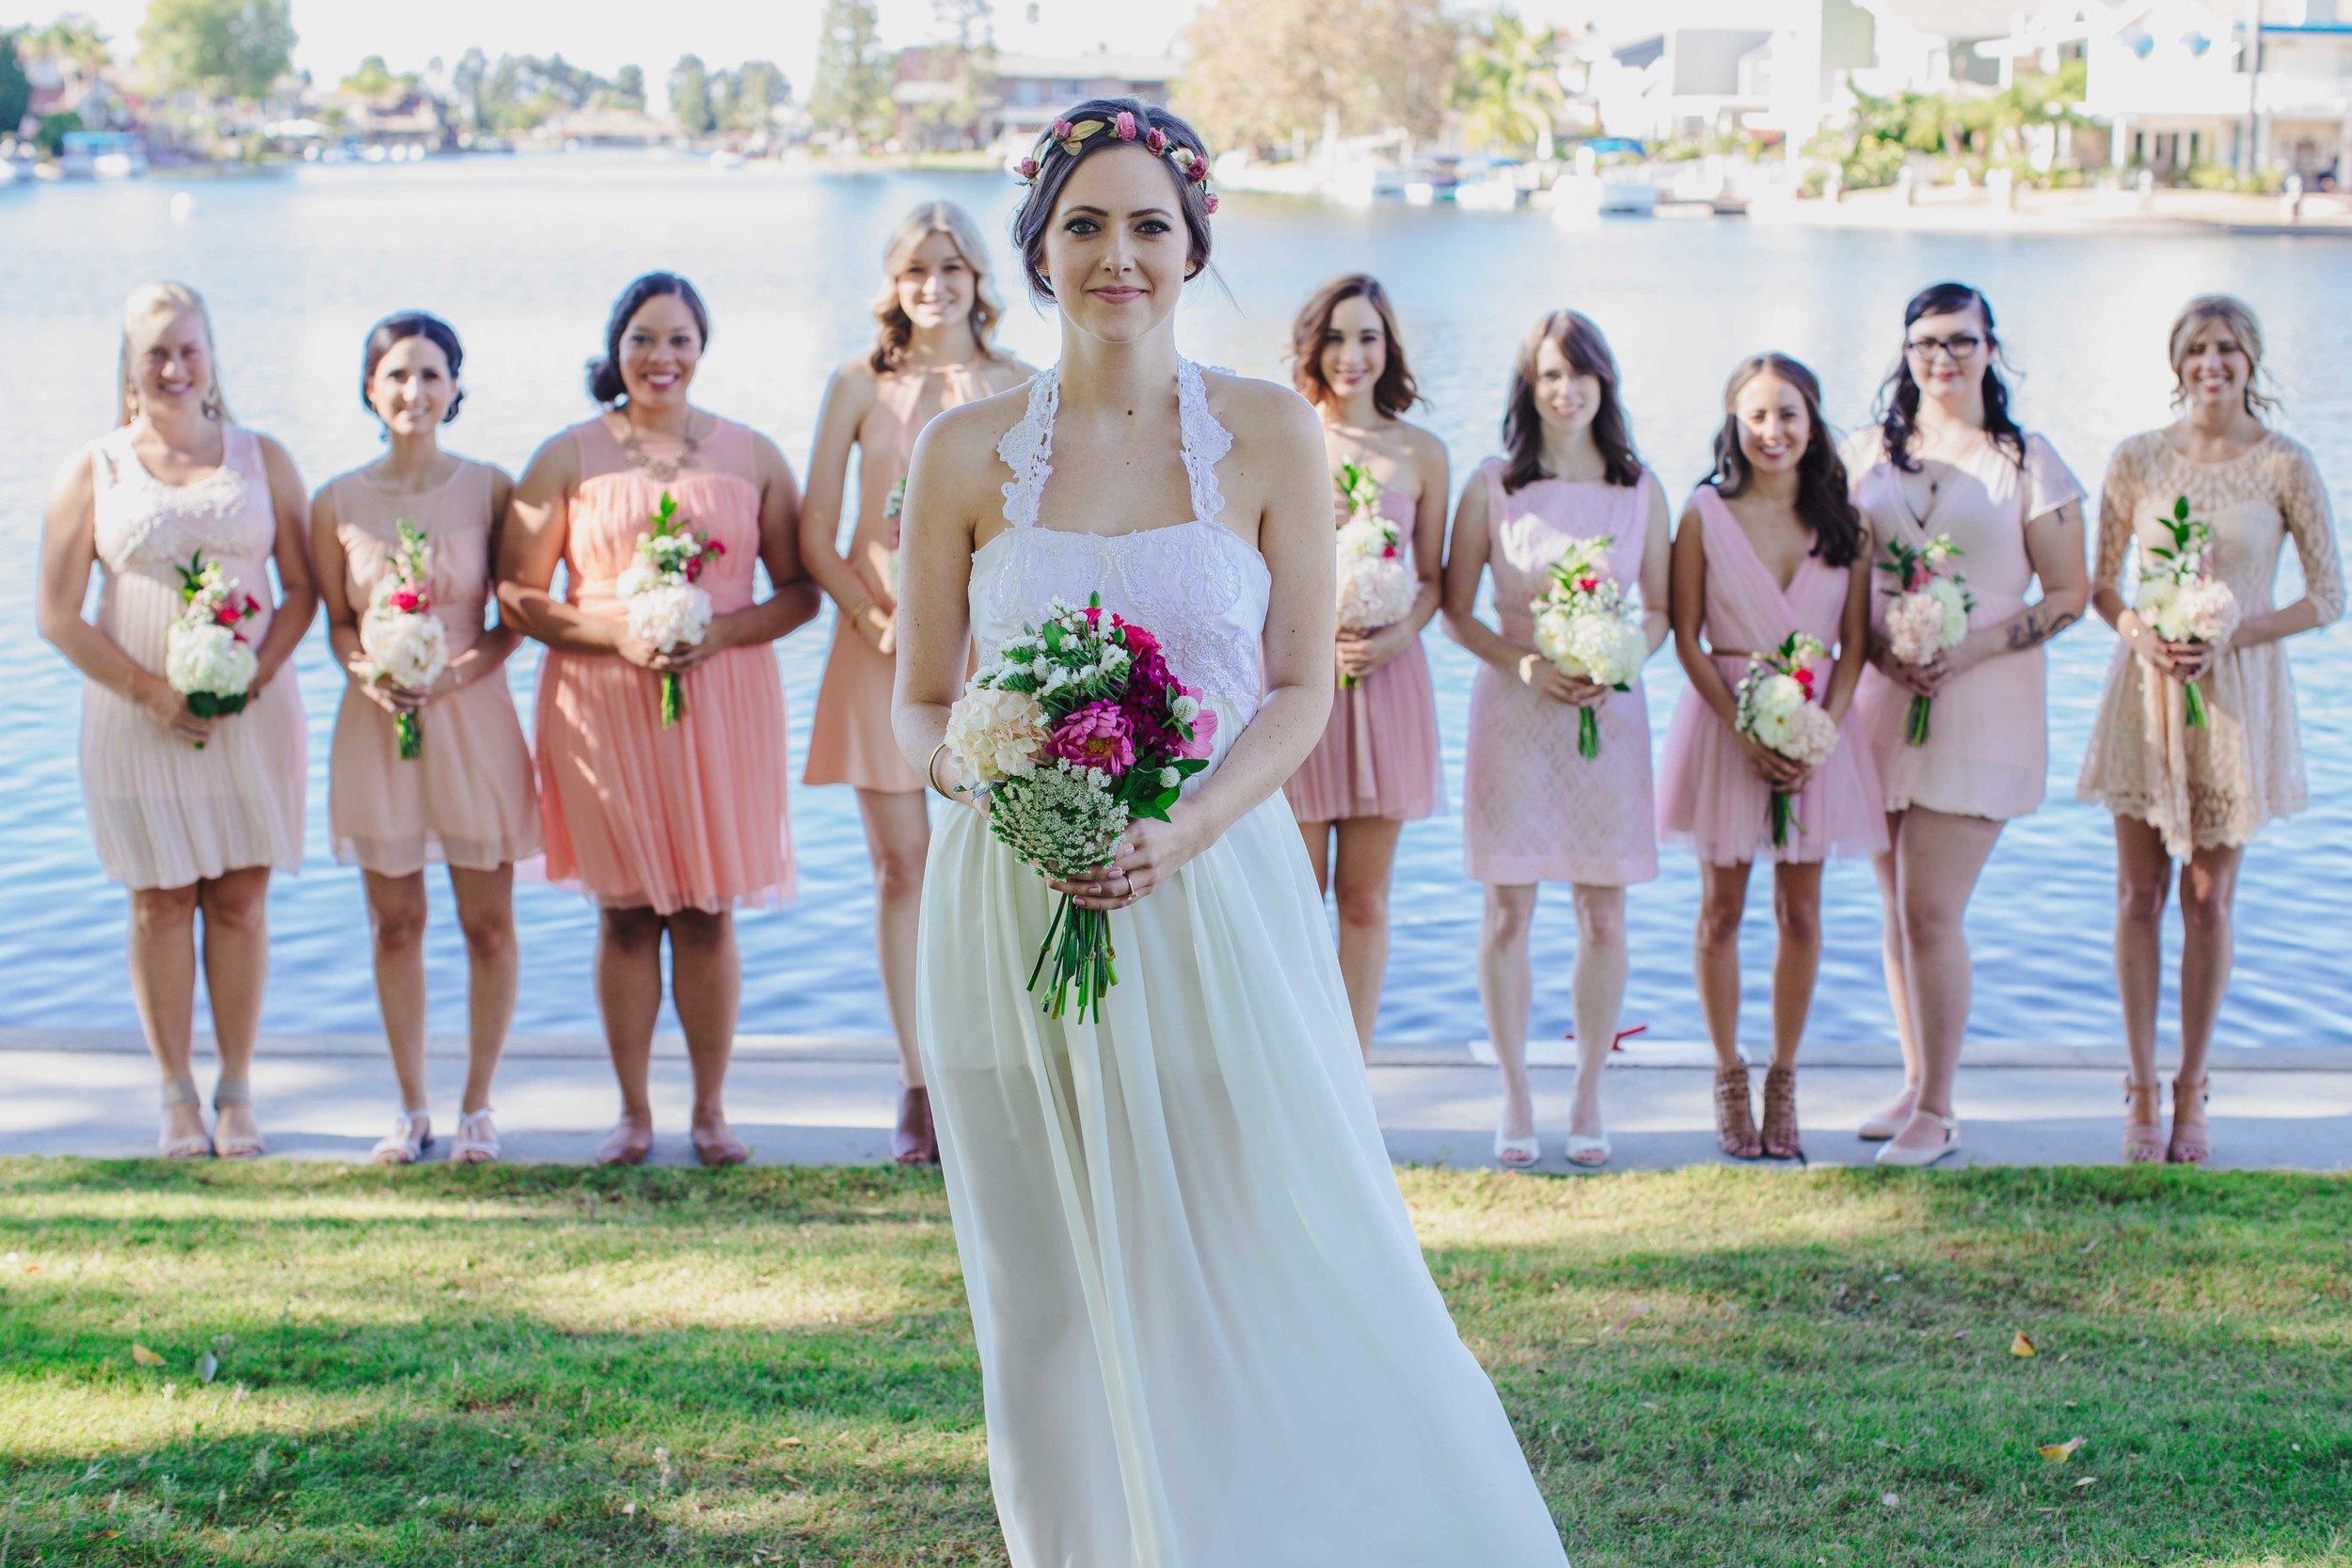 20141024-DePartee-Wedding-APavone-019-sm.jpg